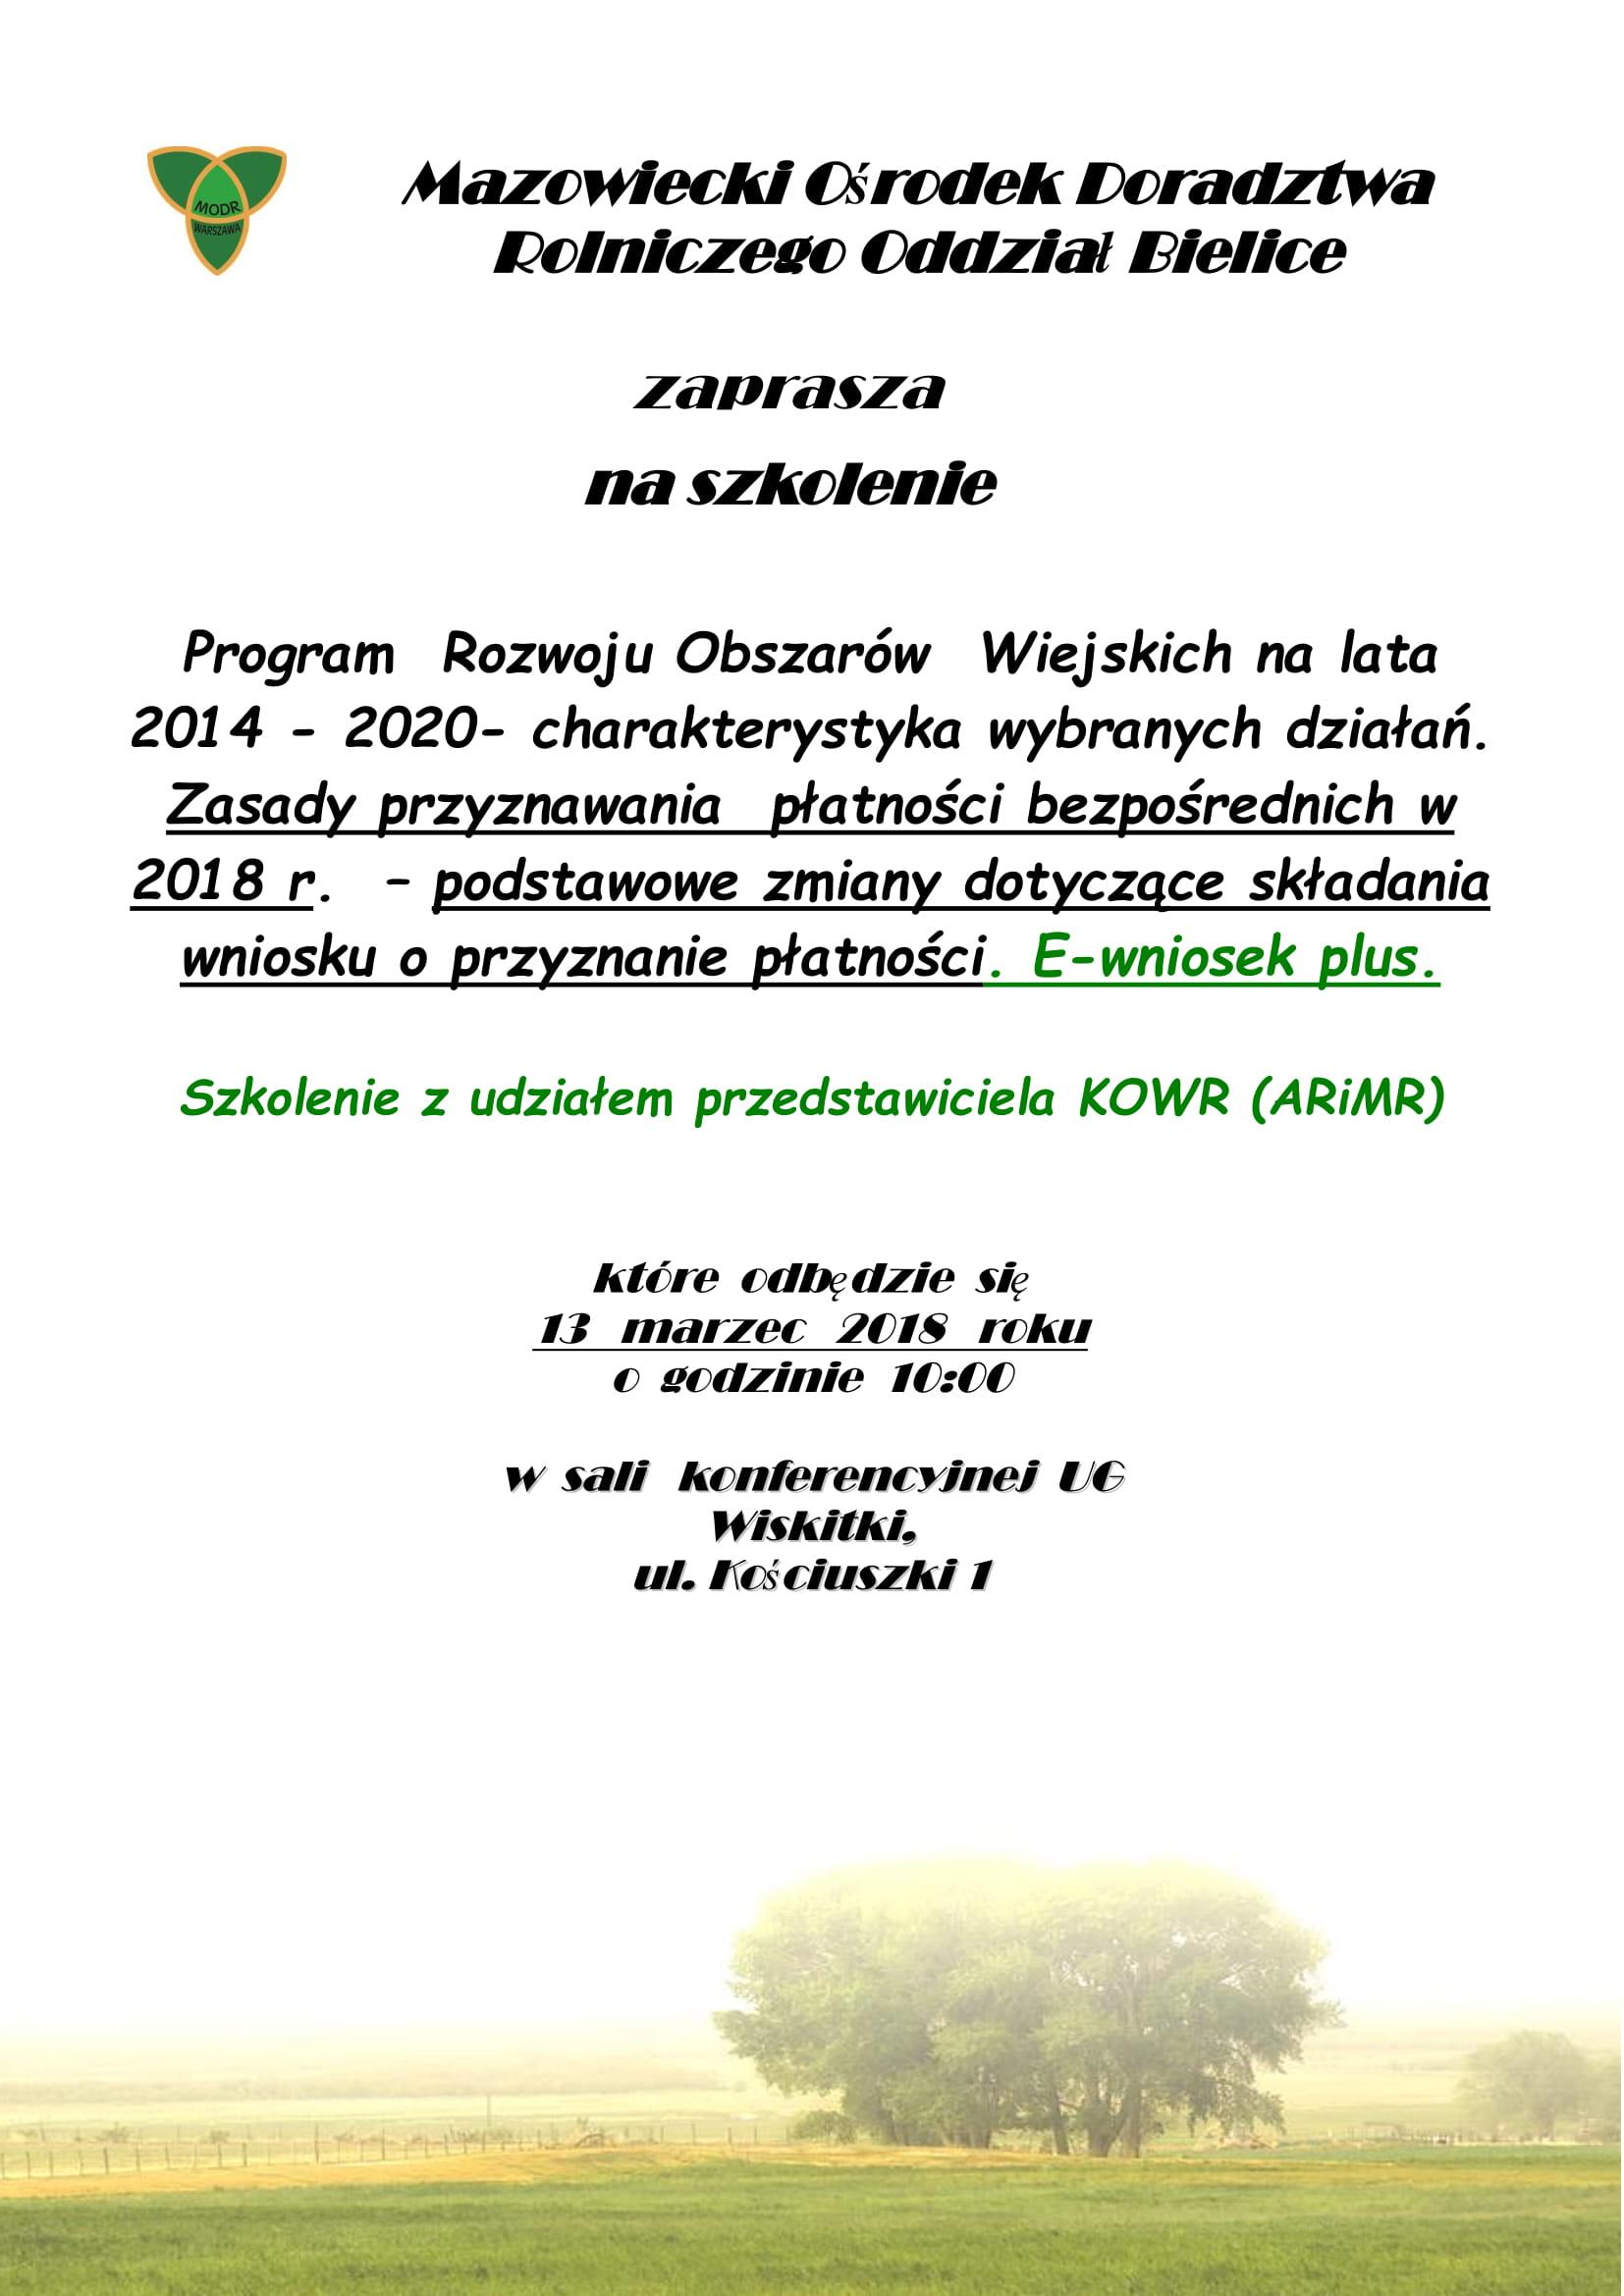 Plakat A4, - Kopia (2)-1